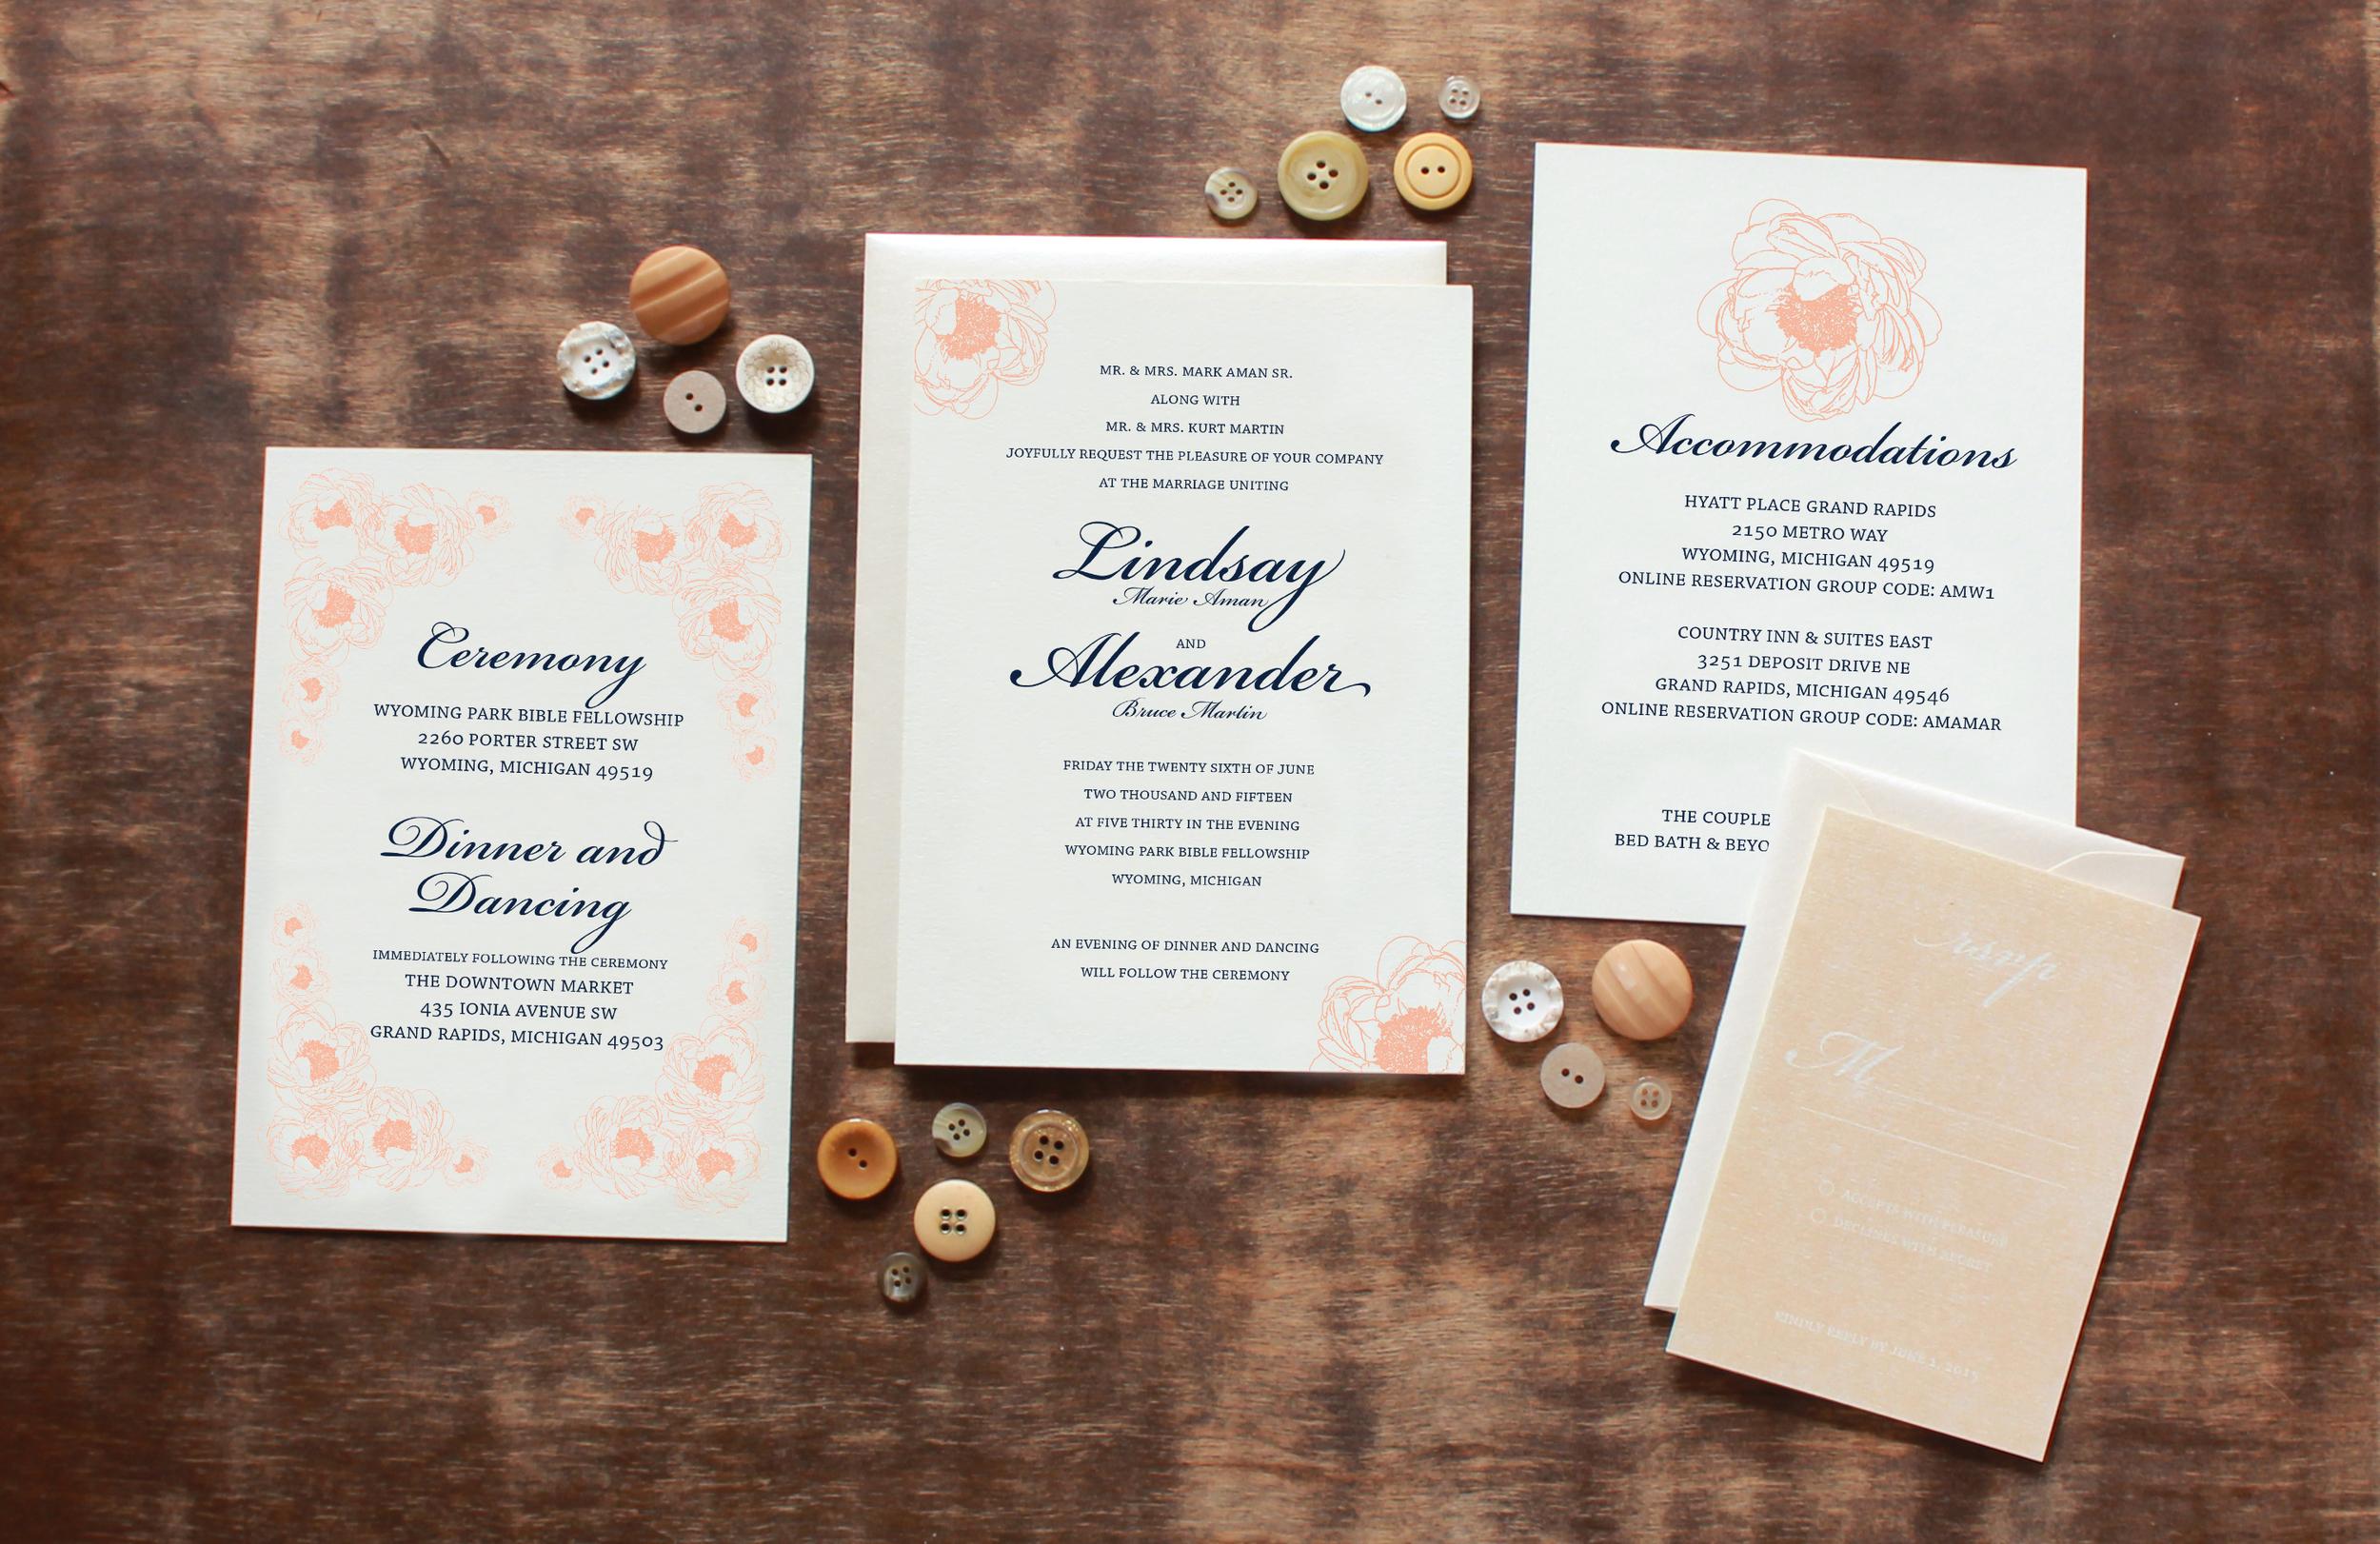 L+A_Wedding Stationery pic 1.jpg